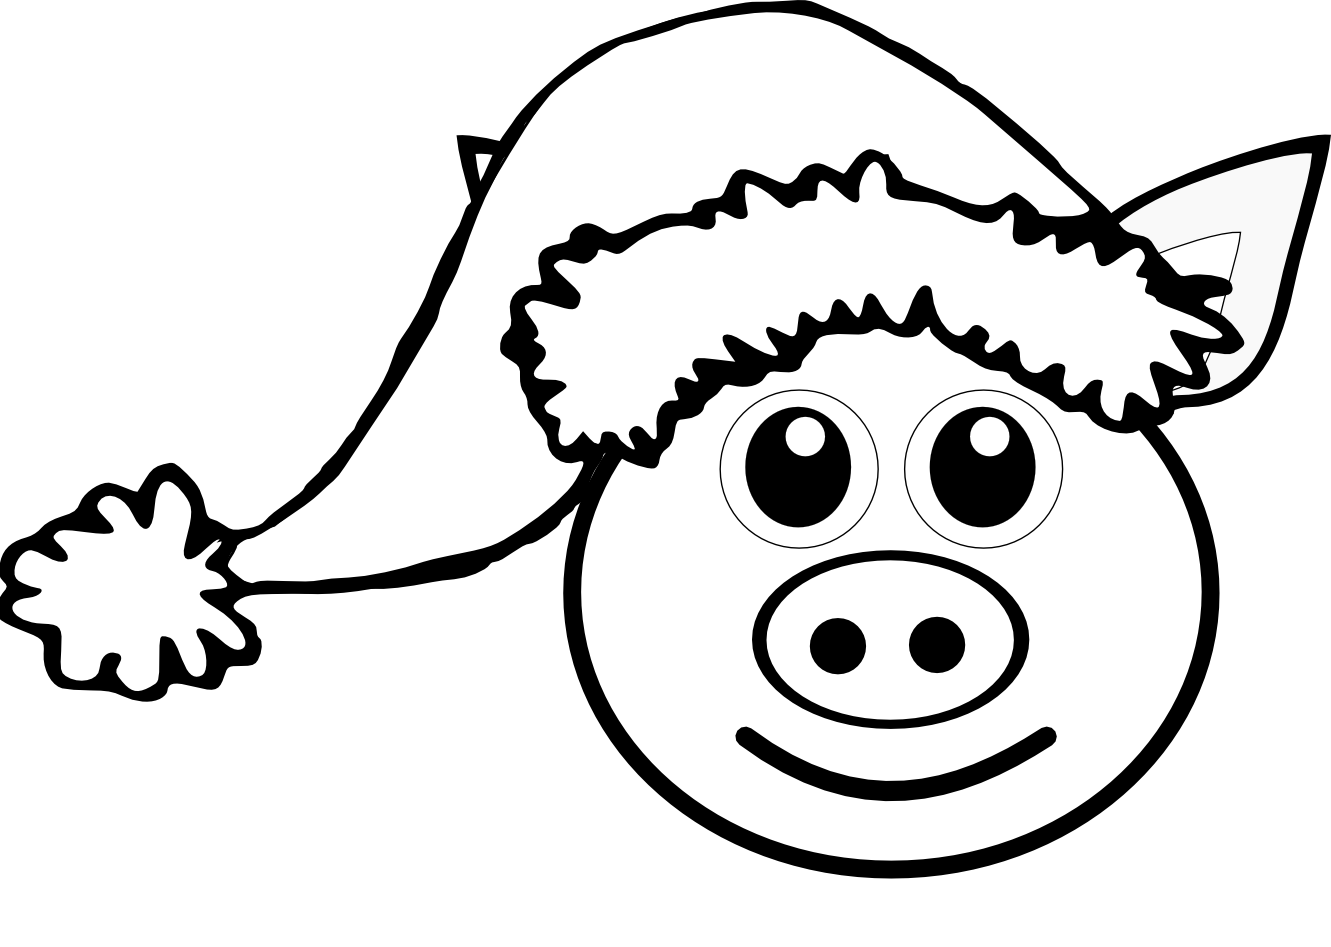 Clipart face guinea pig. Cute drawing at getdrawings